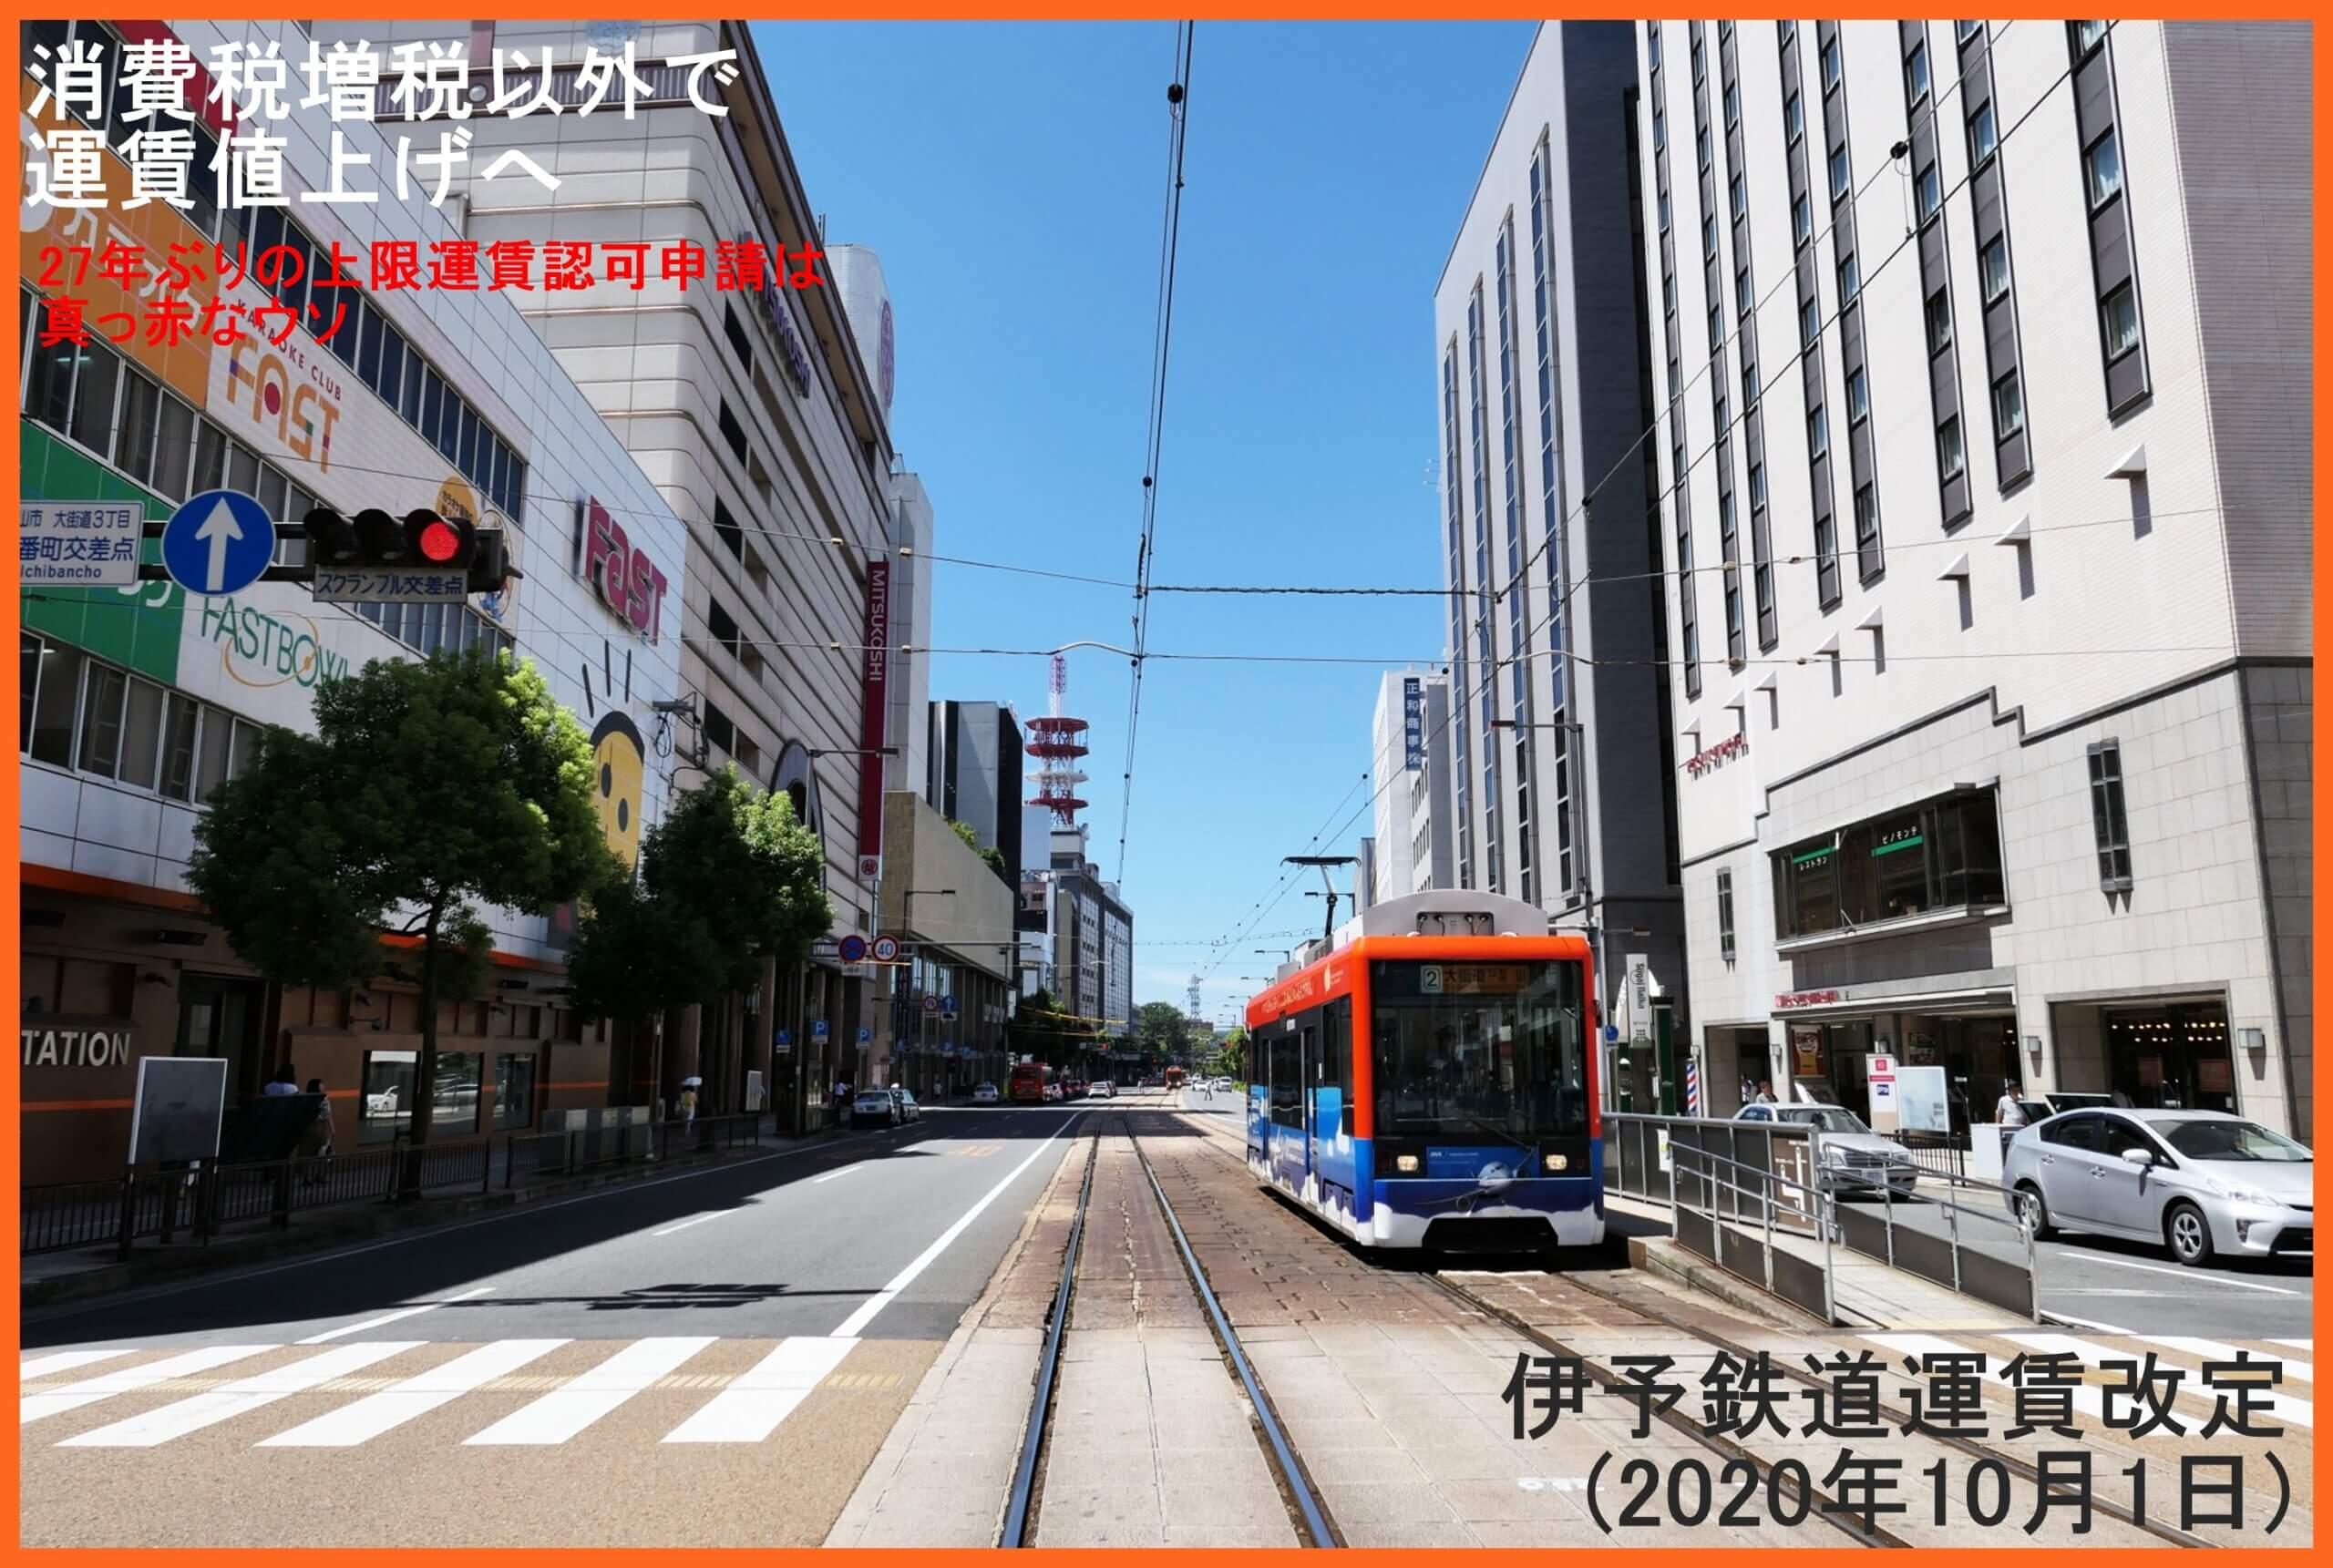 消費税増税以外で運賃値上げへ 伊予鉄道運賃改定(2020年10月1日)